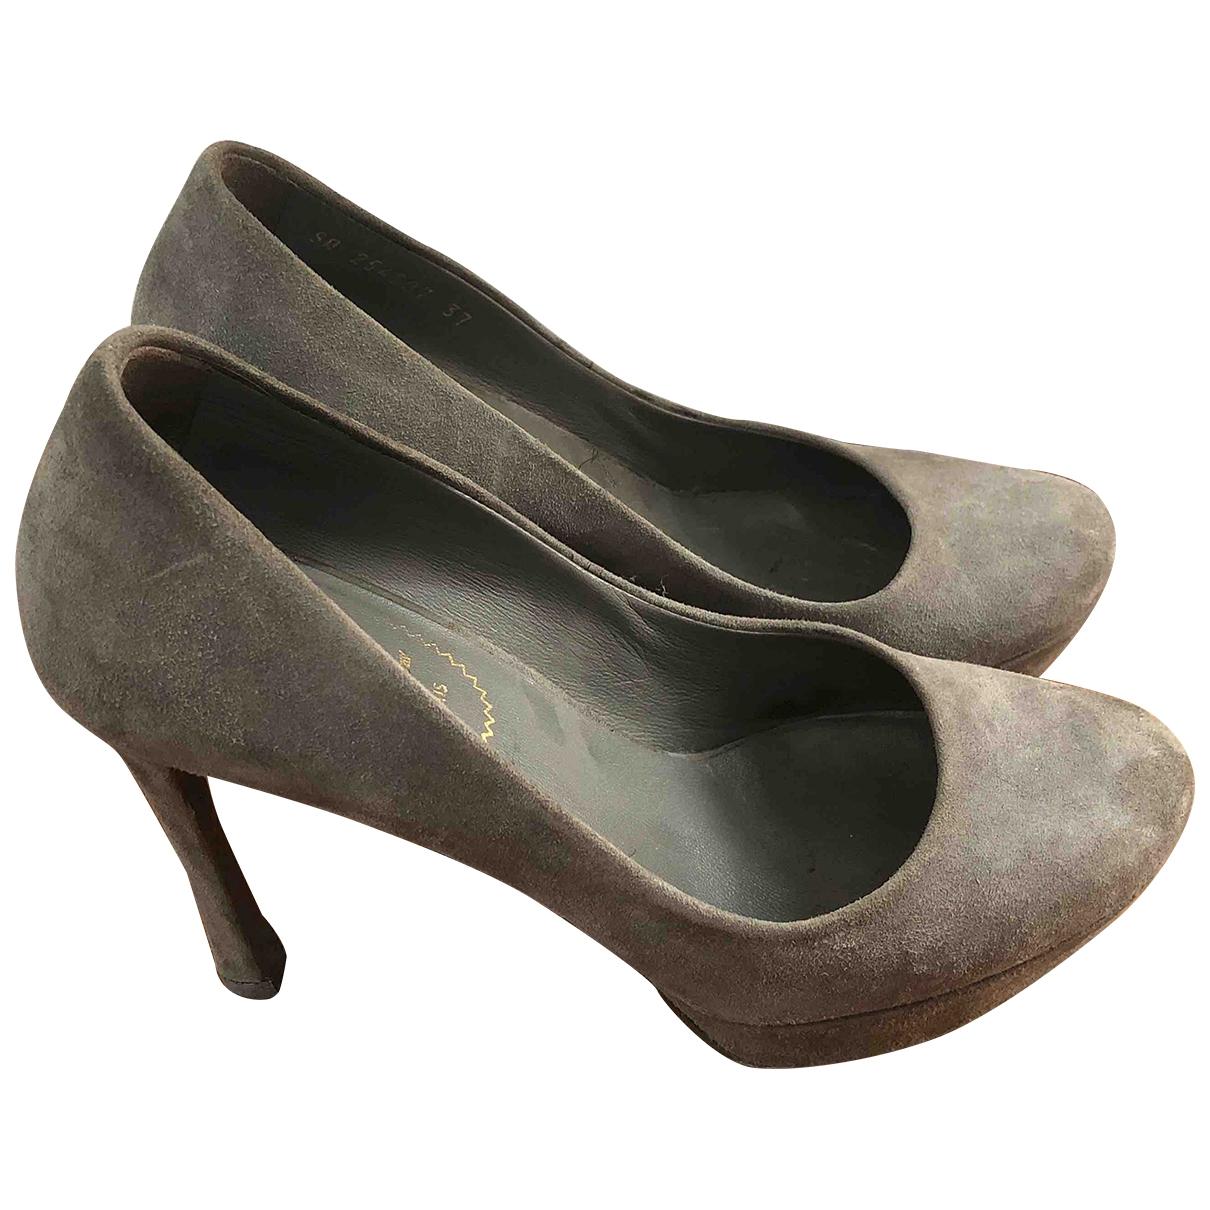 Yves Saint Laurent Trib Too Grey Suede Heels for Women 37 EU